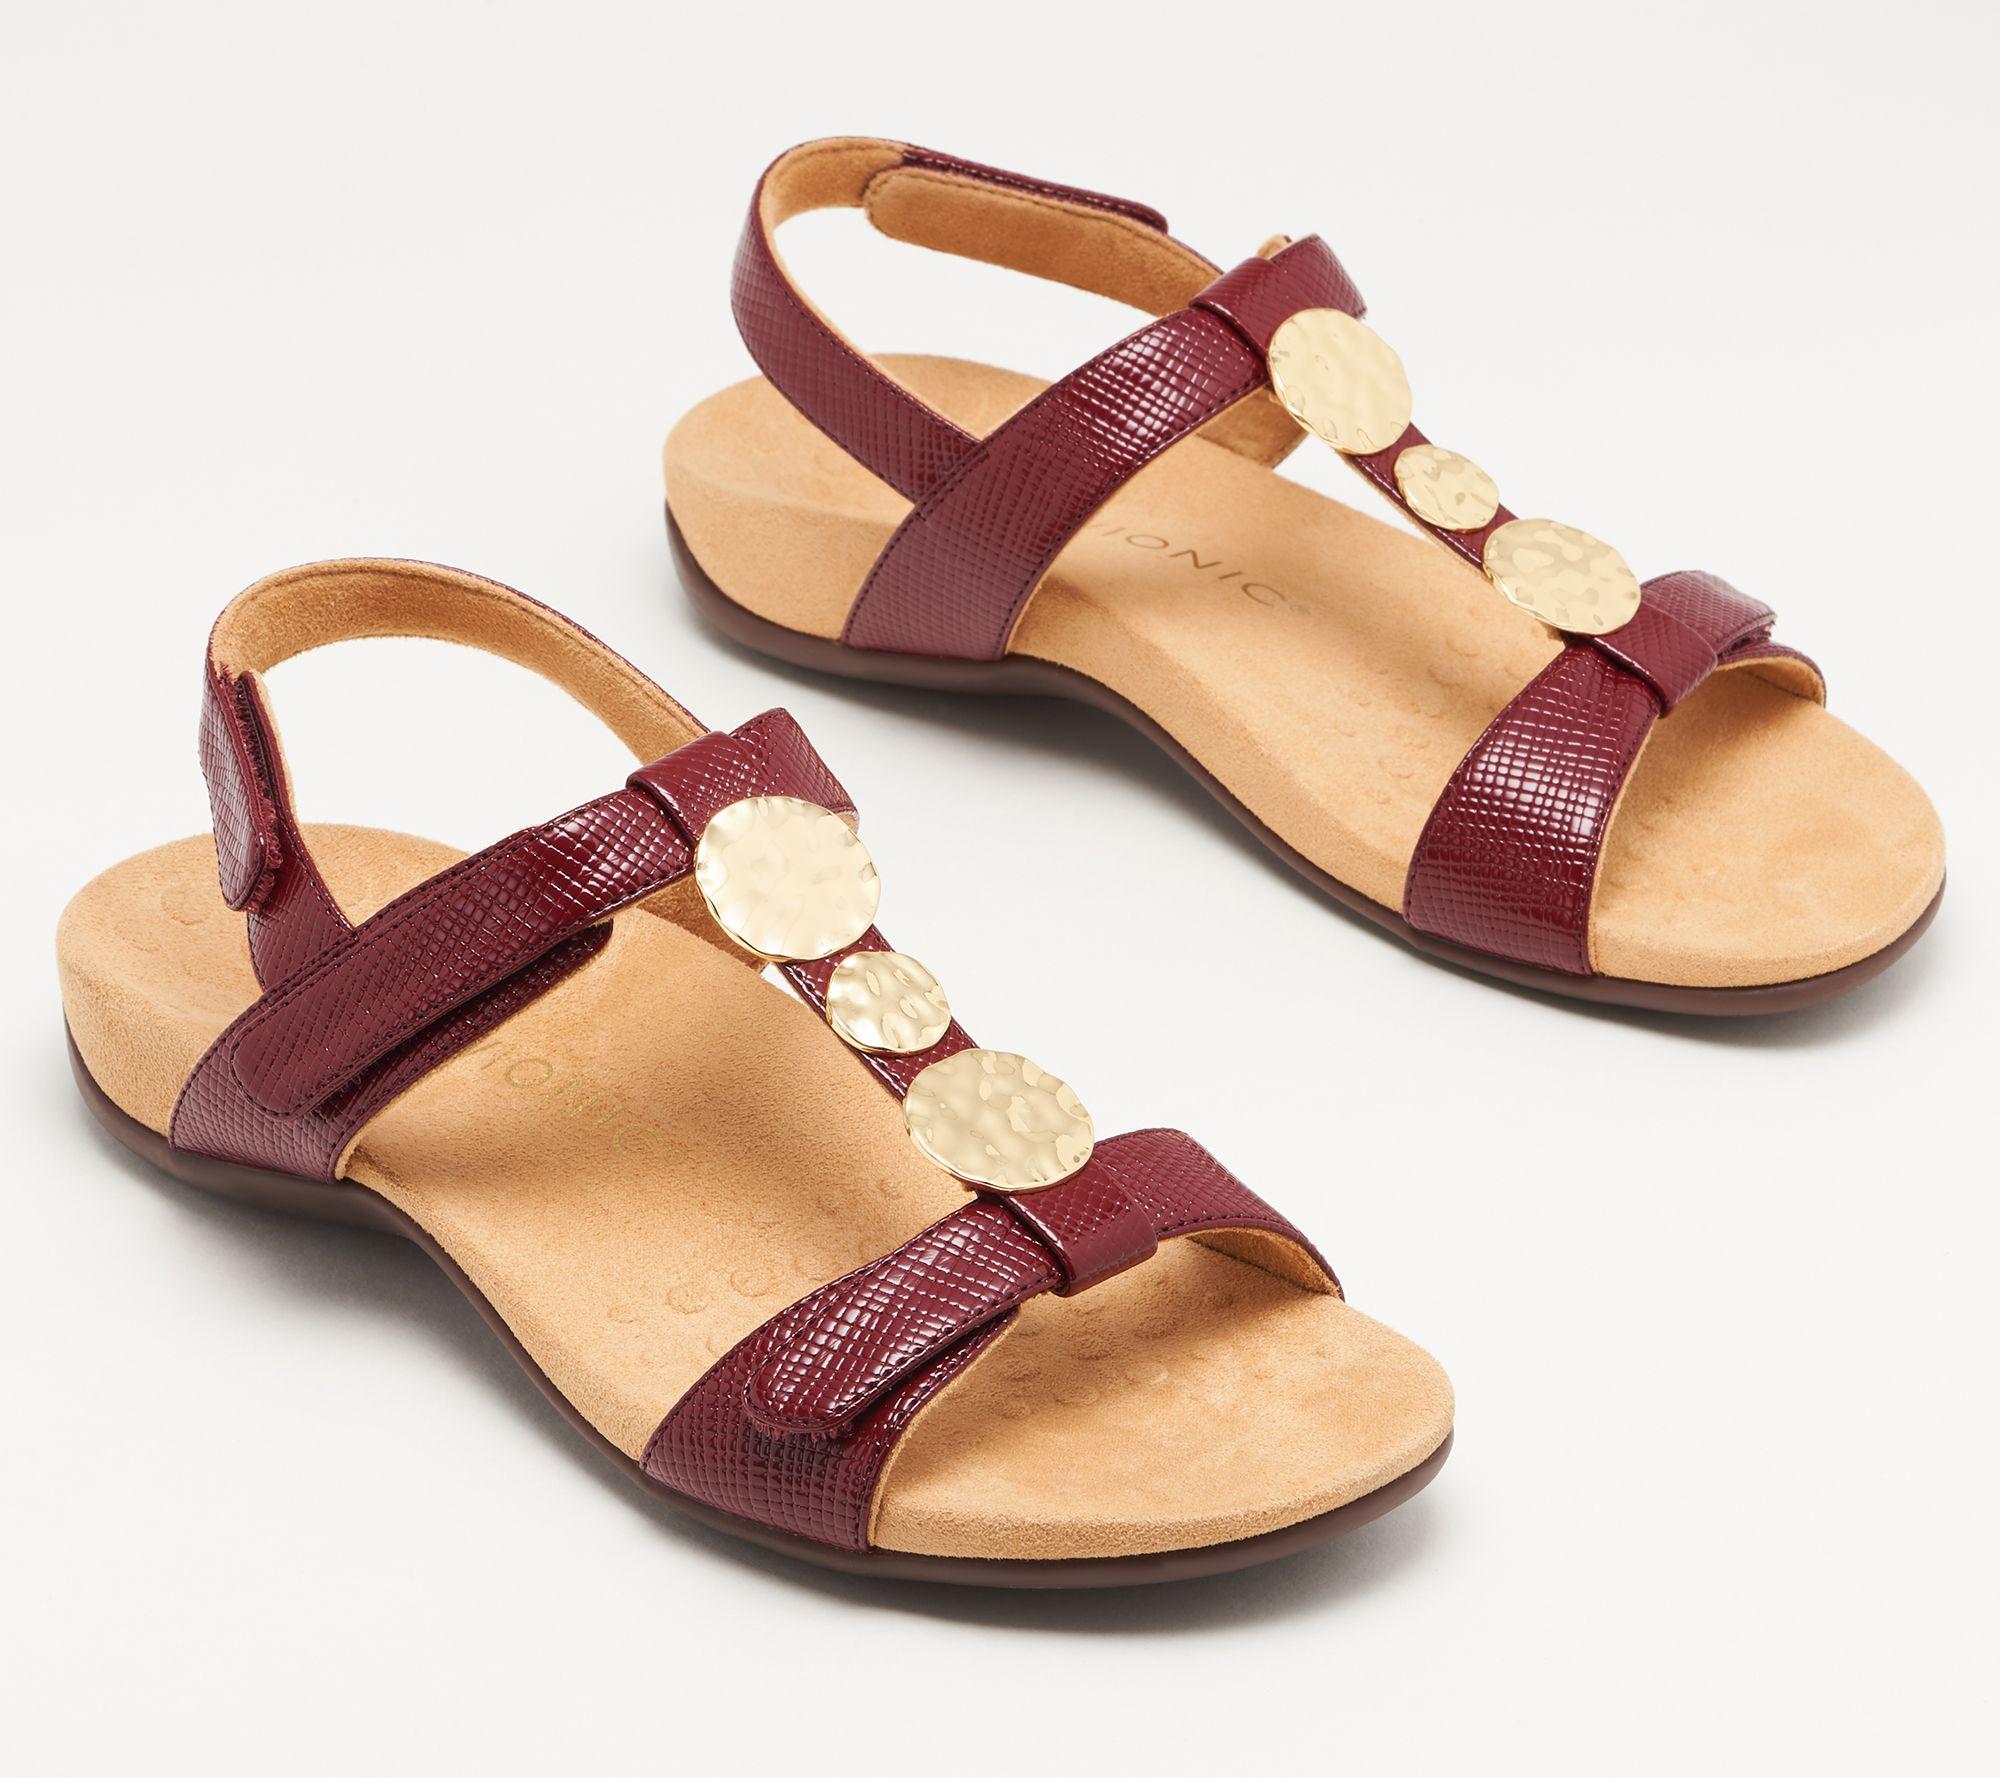 2ee5683597 Vionic Embellished Backstrap Sandals - Farra Lizard - Page 1 — QVC.com